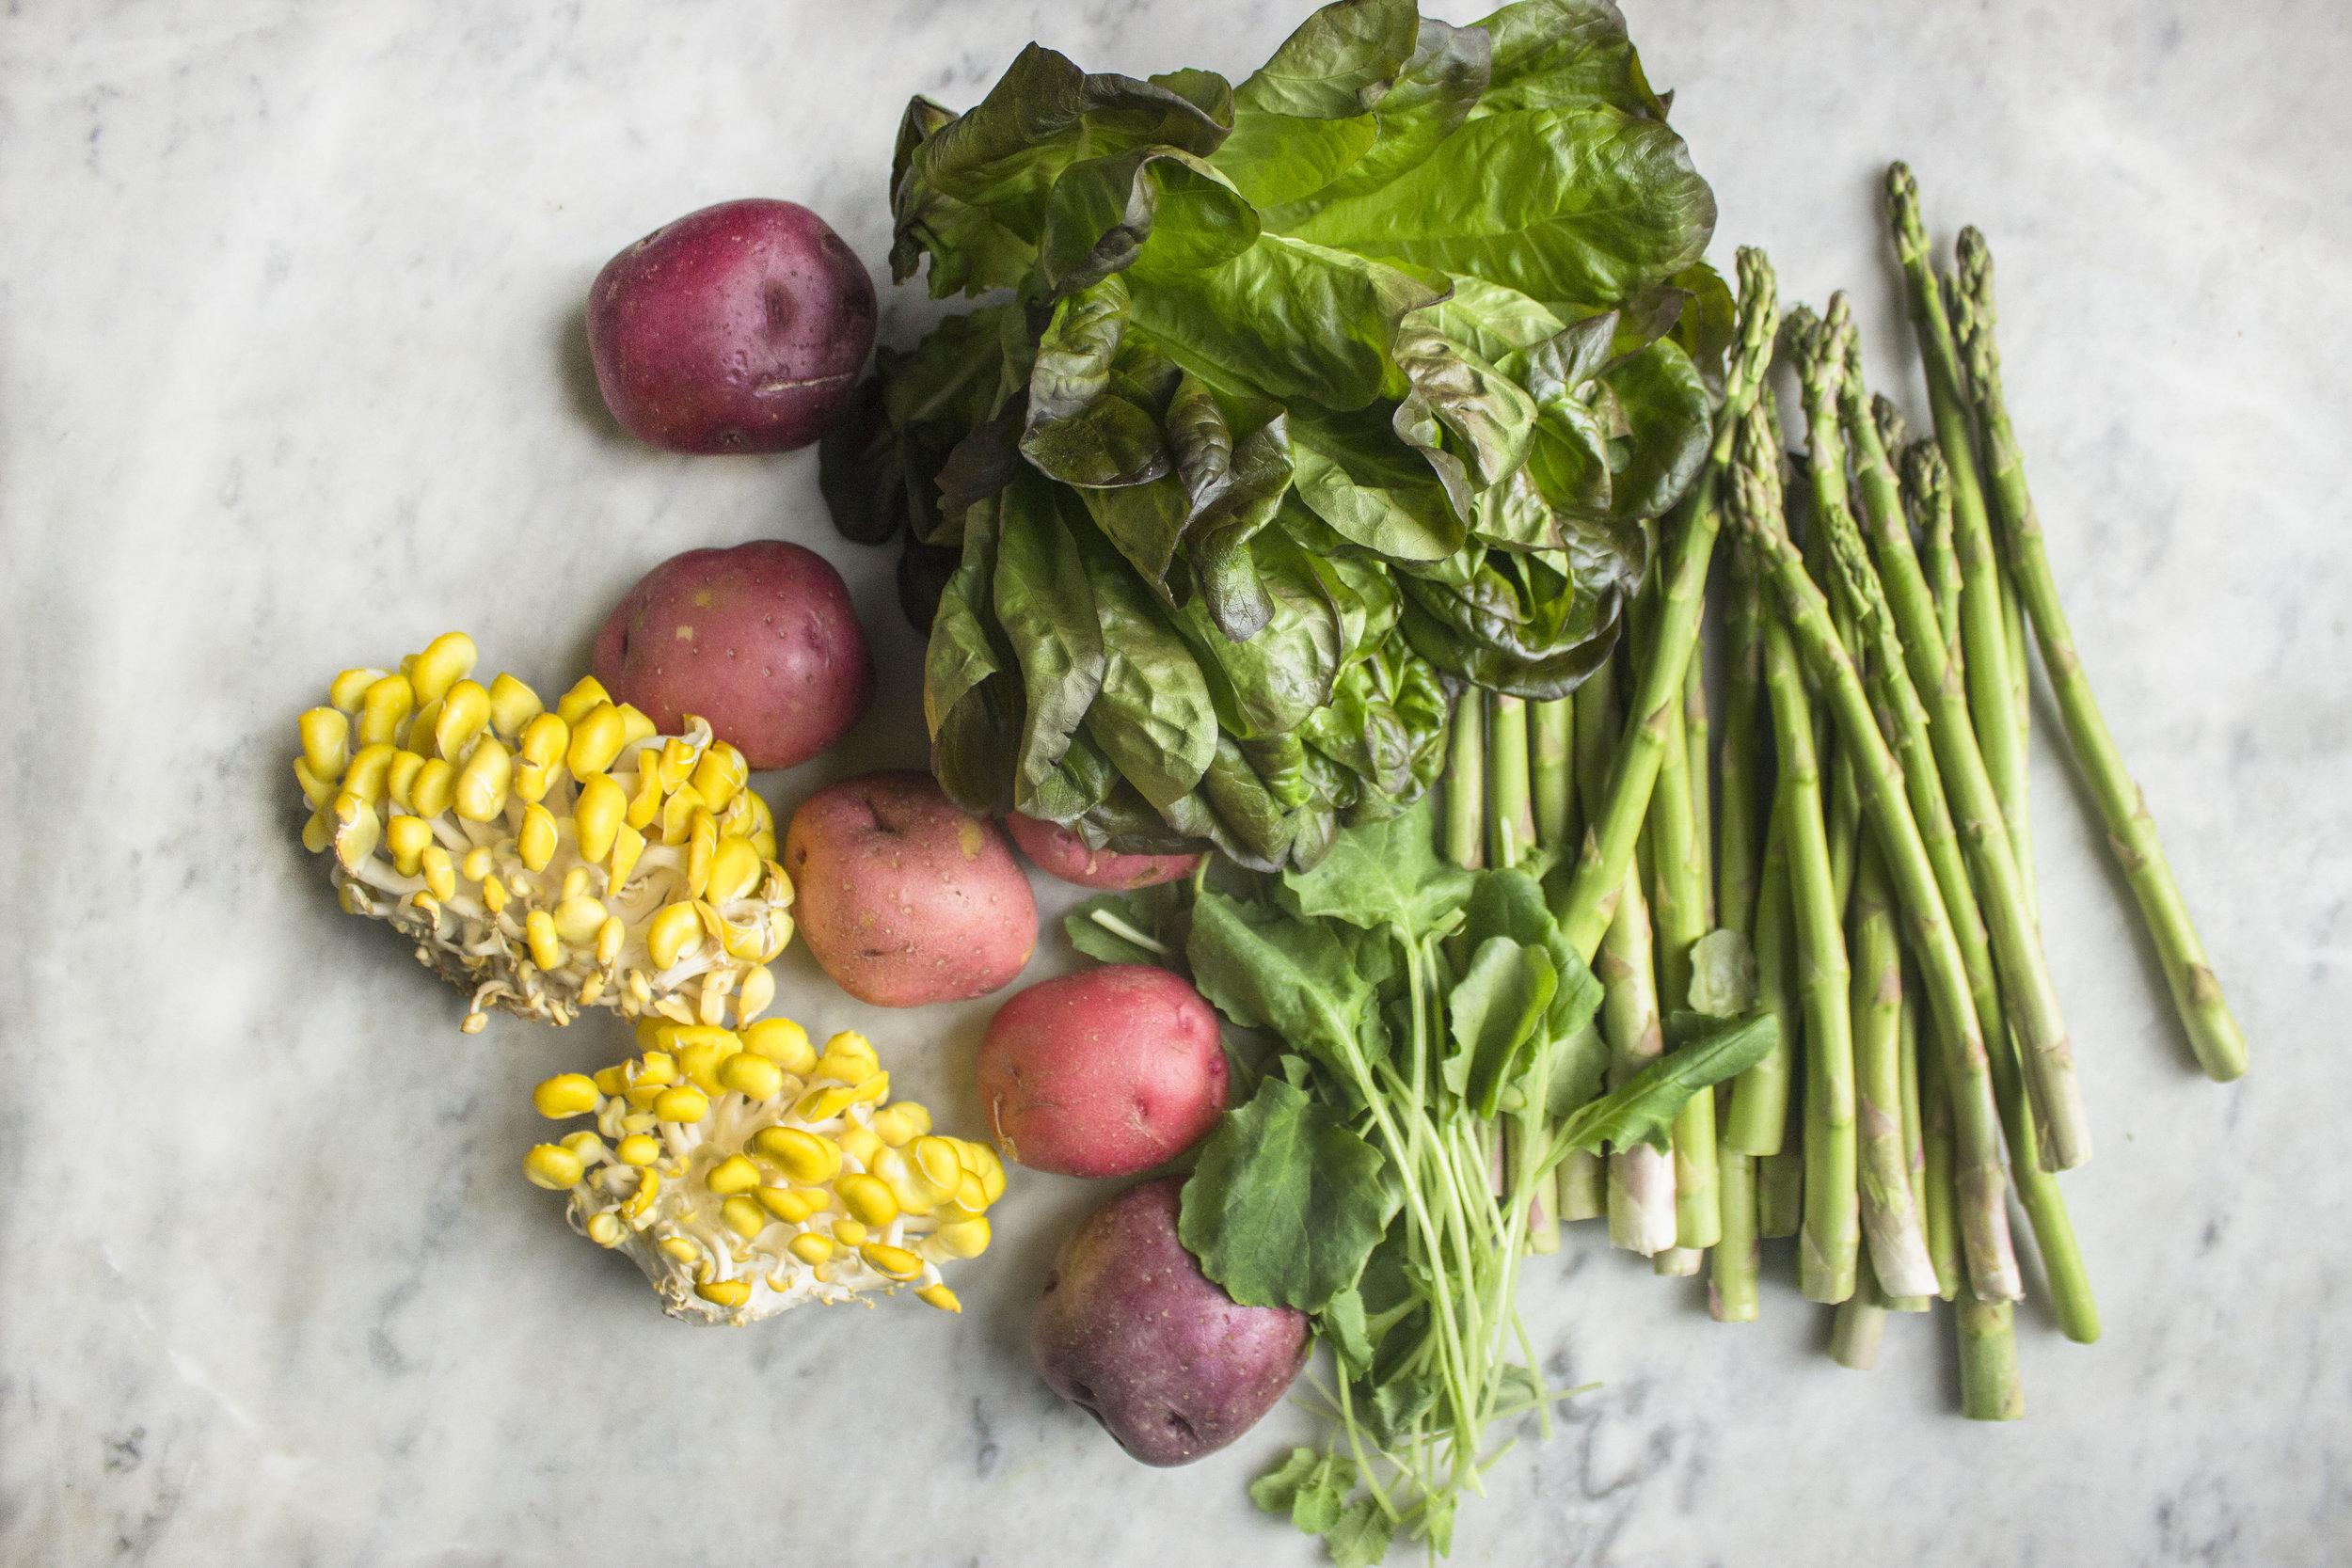 veggie bounty 3.jpg